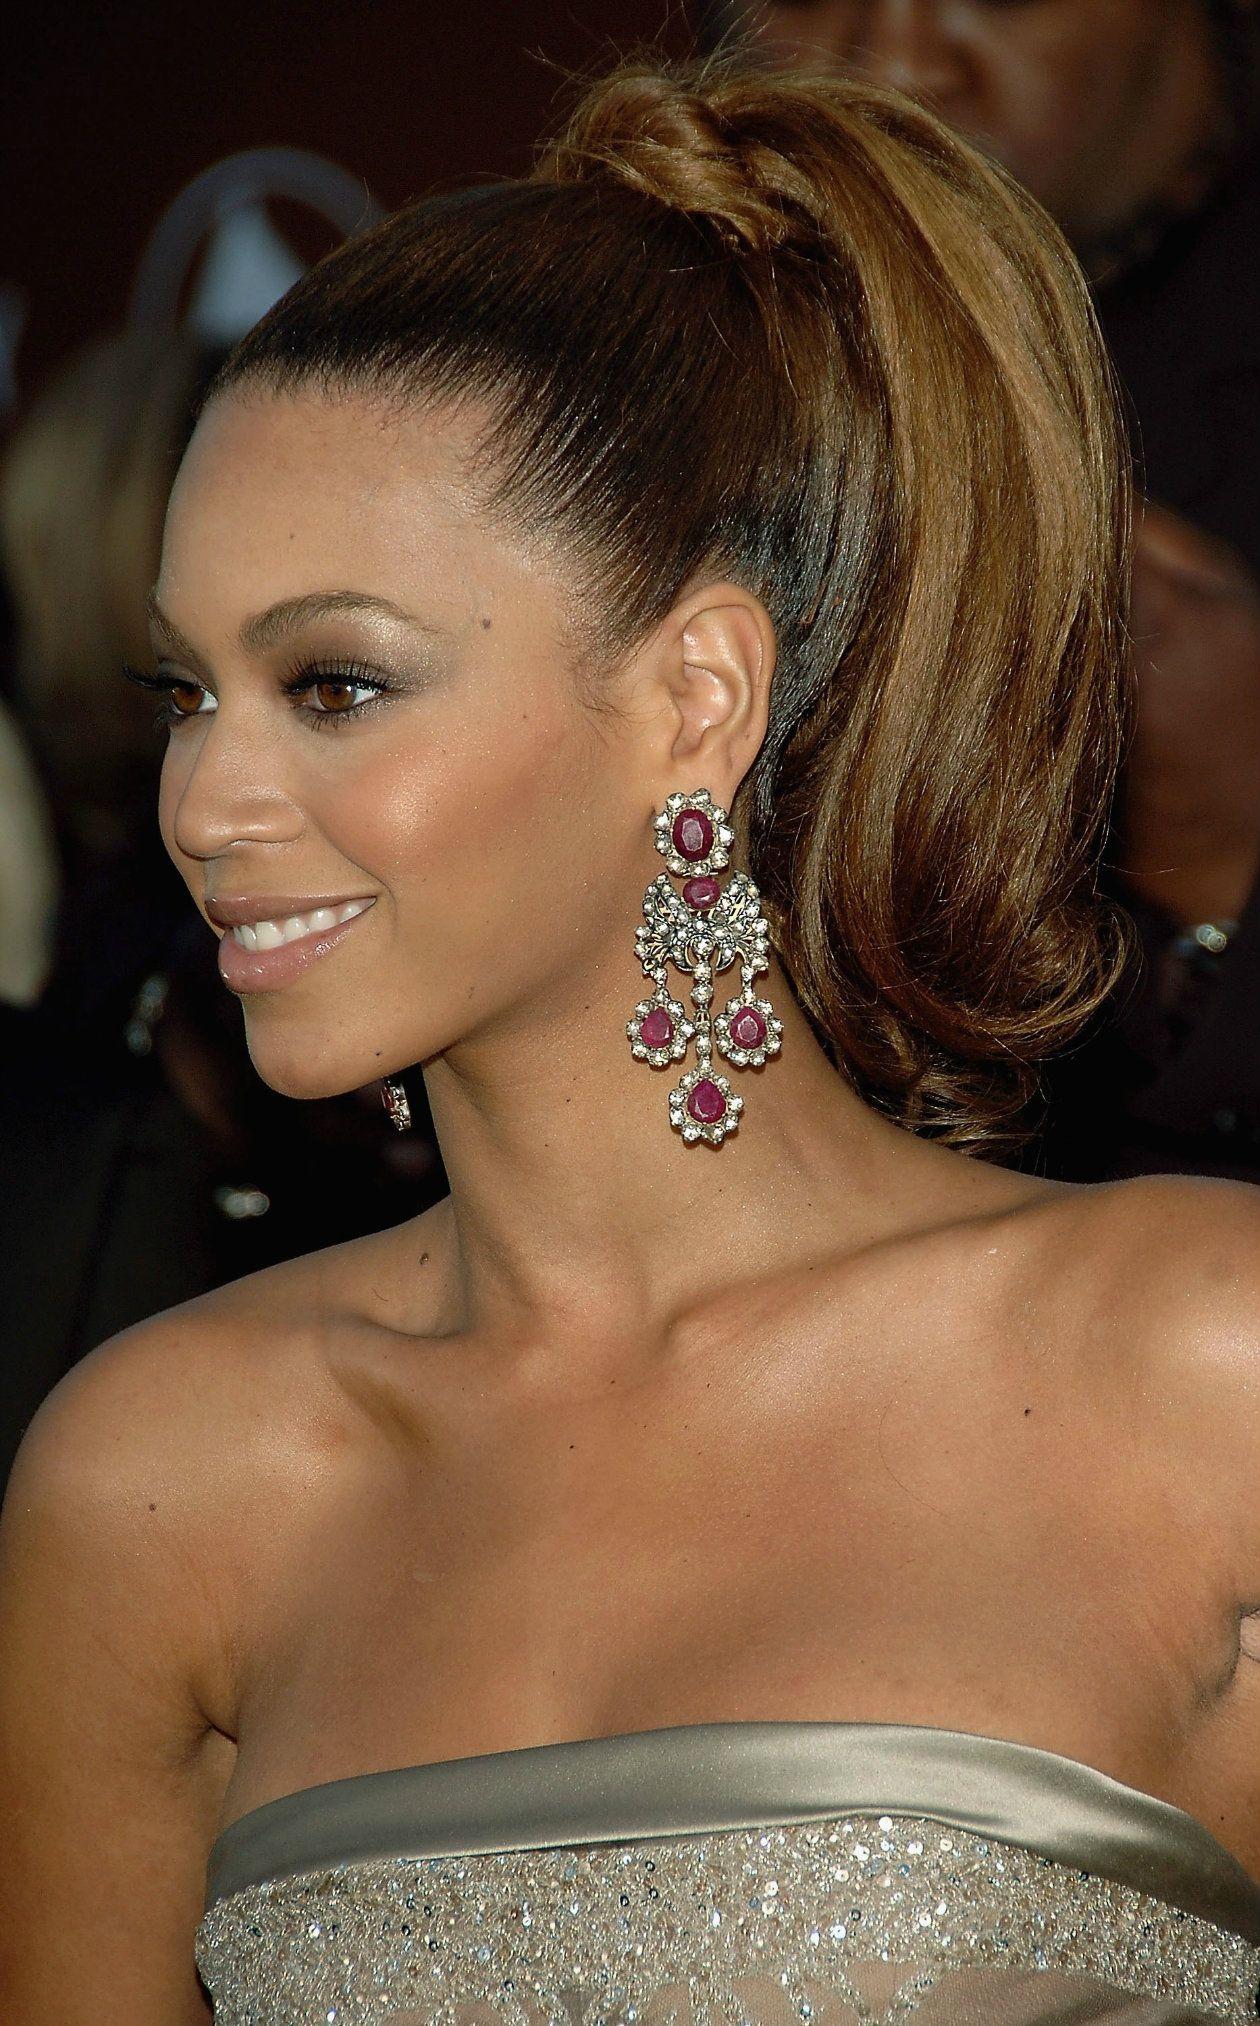 Cómo conseguir un peinados cola alta Fotos de estilo de color de pelo - Cola de caballo | Beyonce hair, High ponytail hairstyles ...